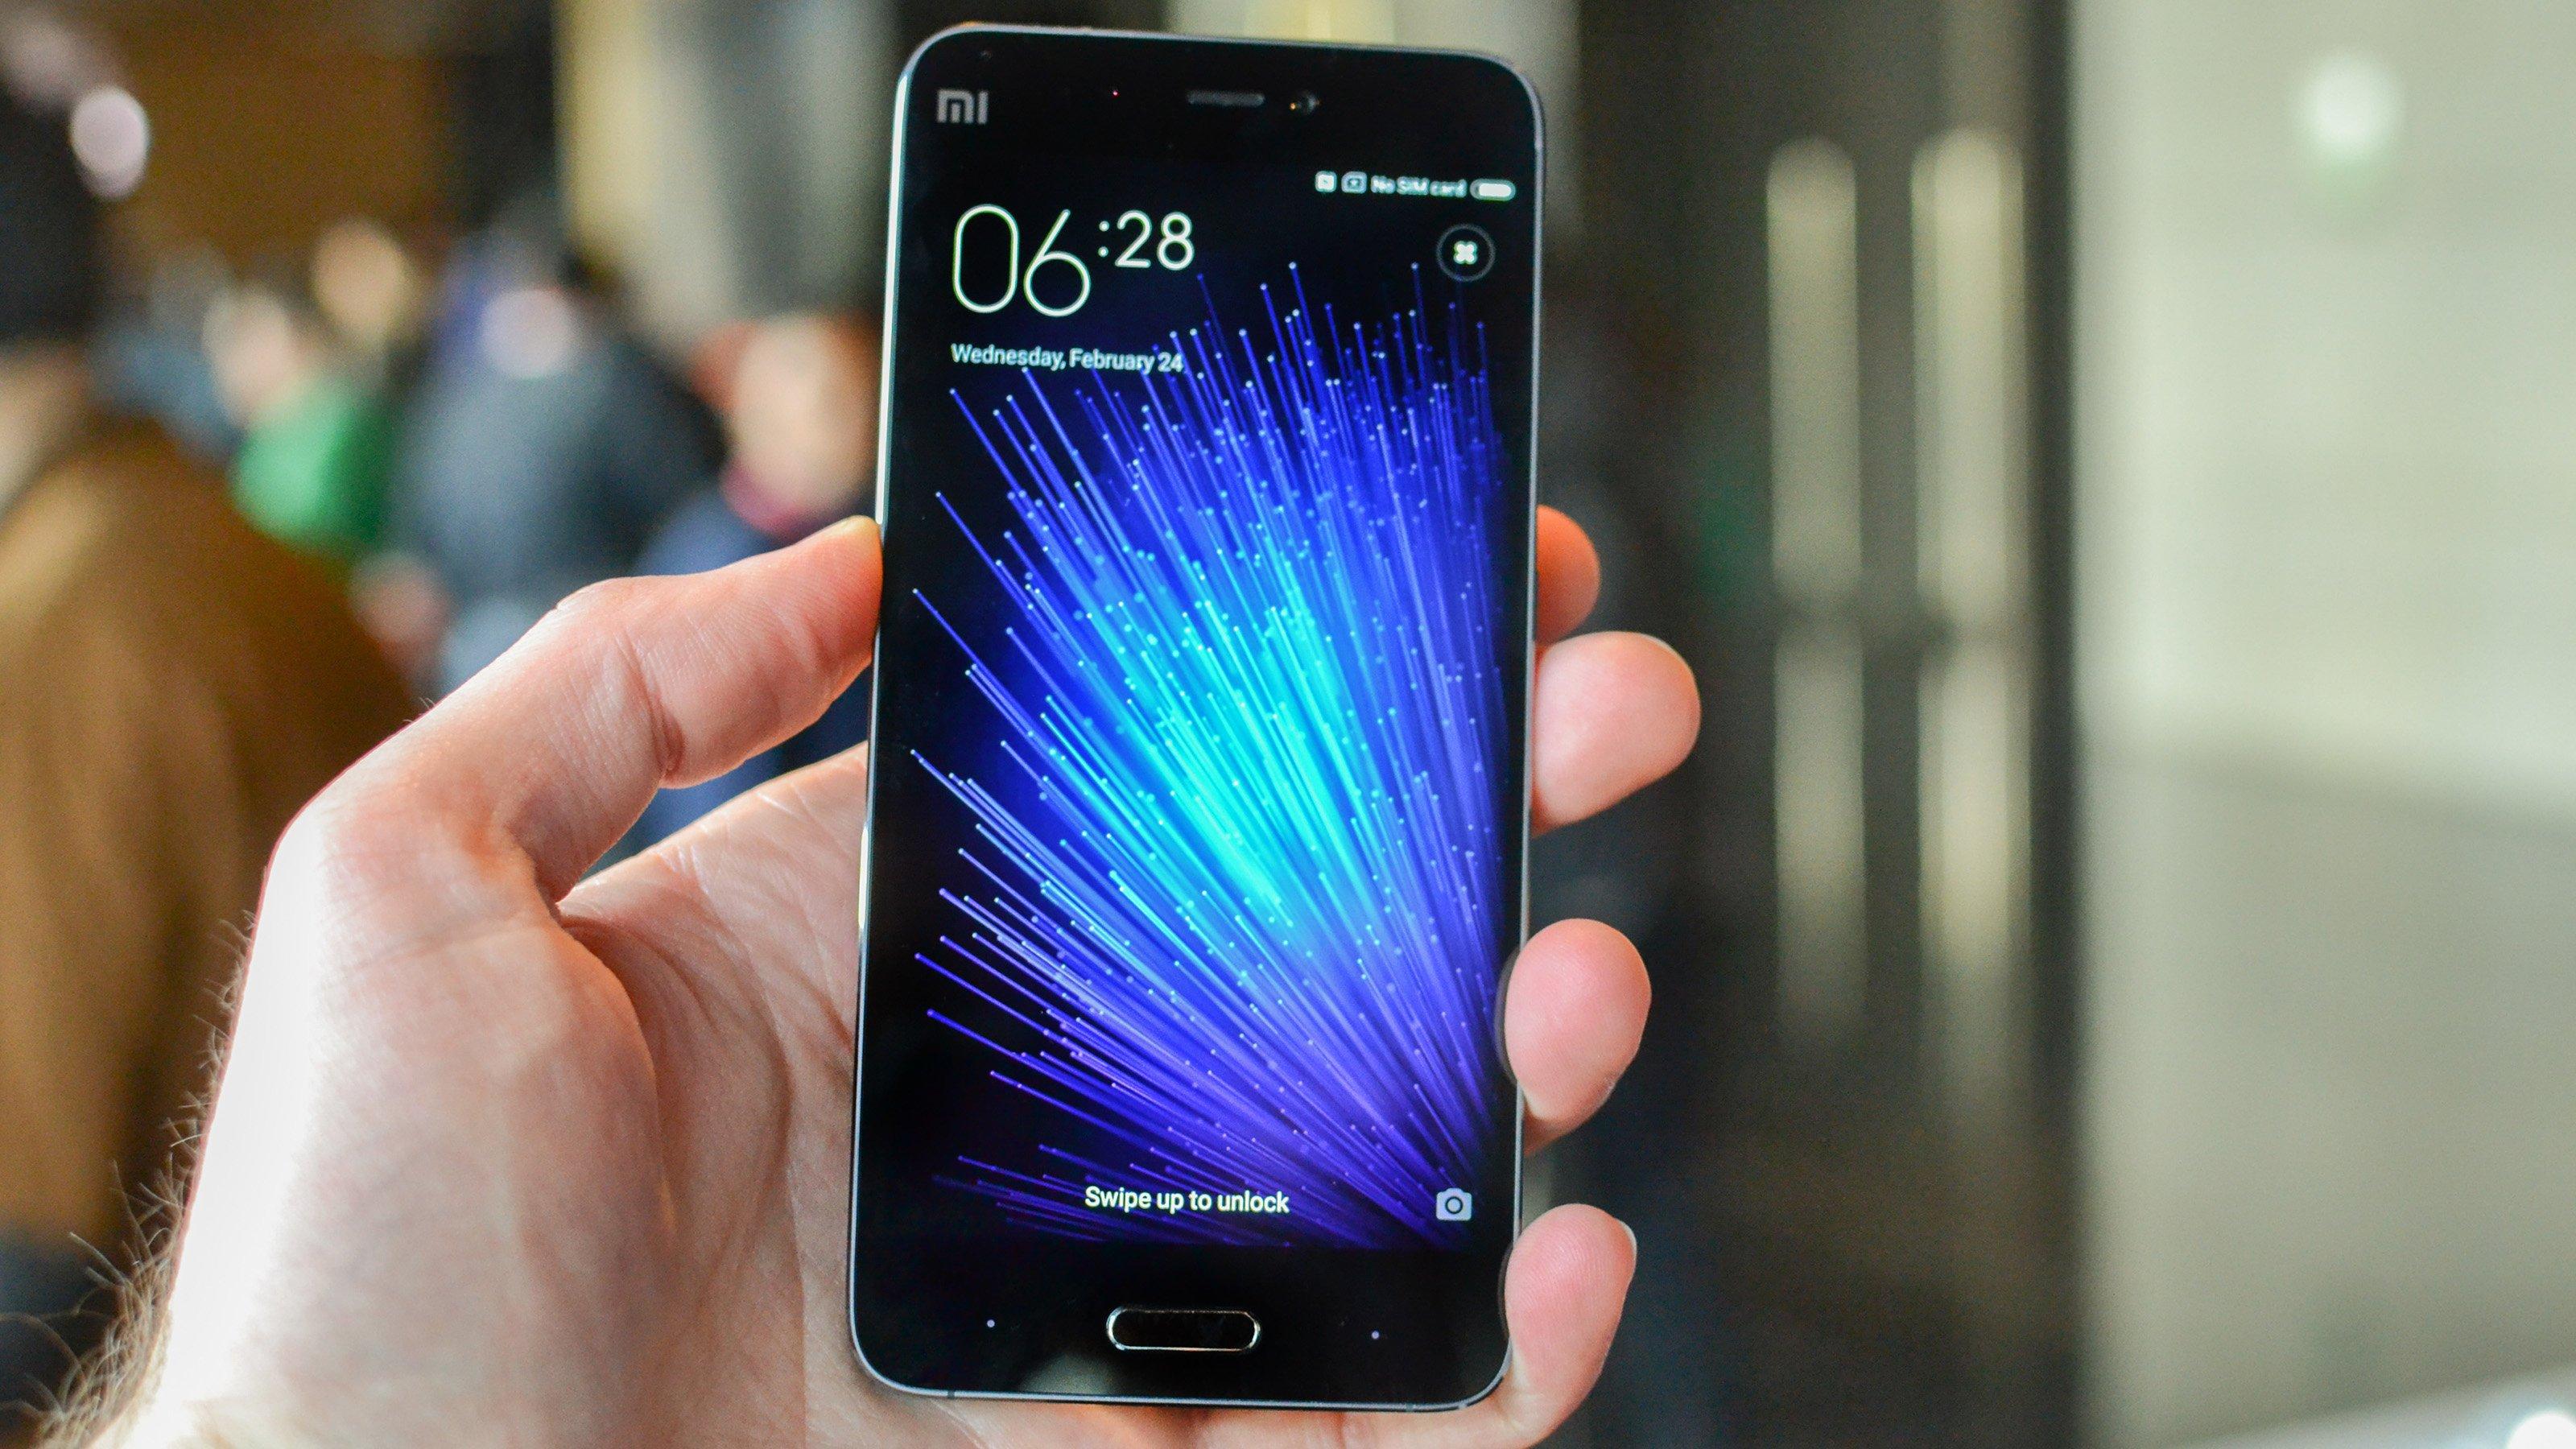 Harga Dan Spek Xiaomi Redmi Note 5 Pro 3gb Ram 32gb Internal Black Tas Anyaman Kulit Asli Chameo Couture Clucth Rafa Brown Cokelat Tua Mi Vs Samsung Galaxy S7 Comparison The Future Is Here